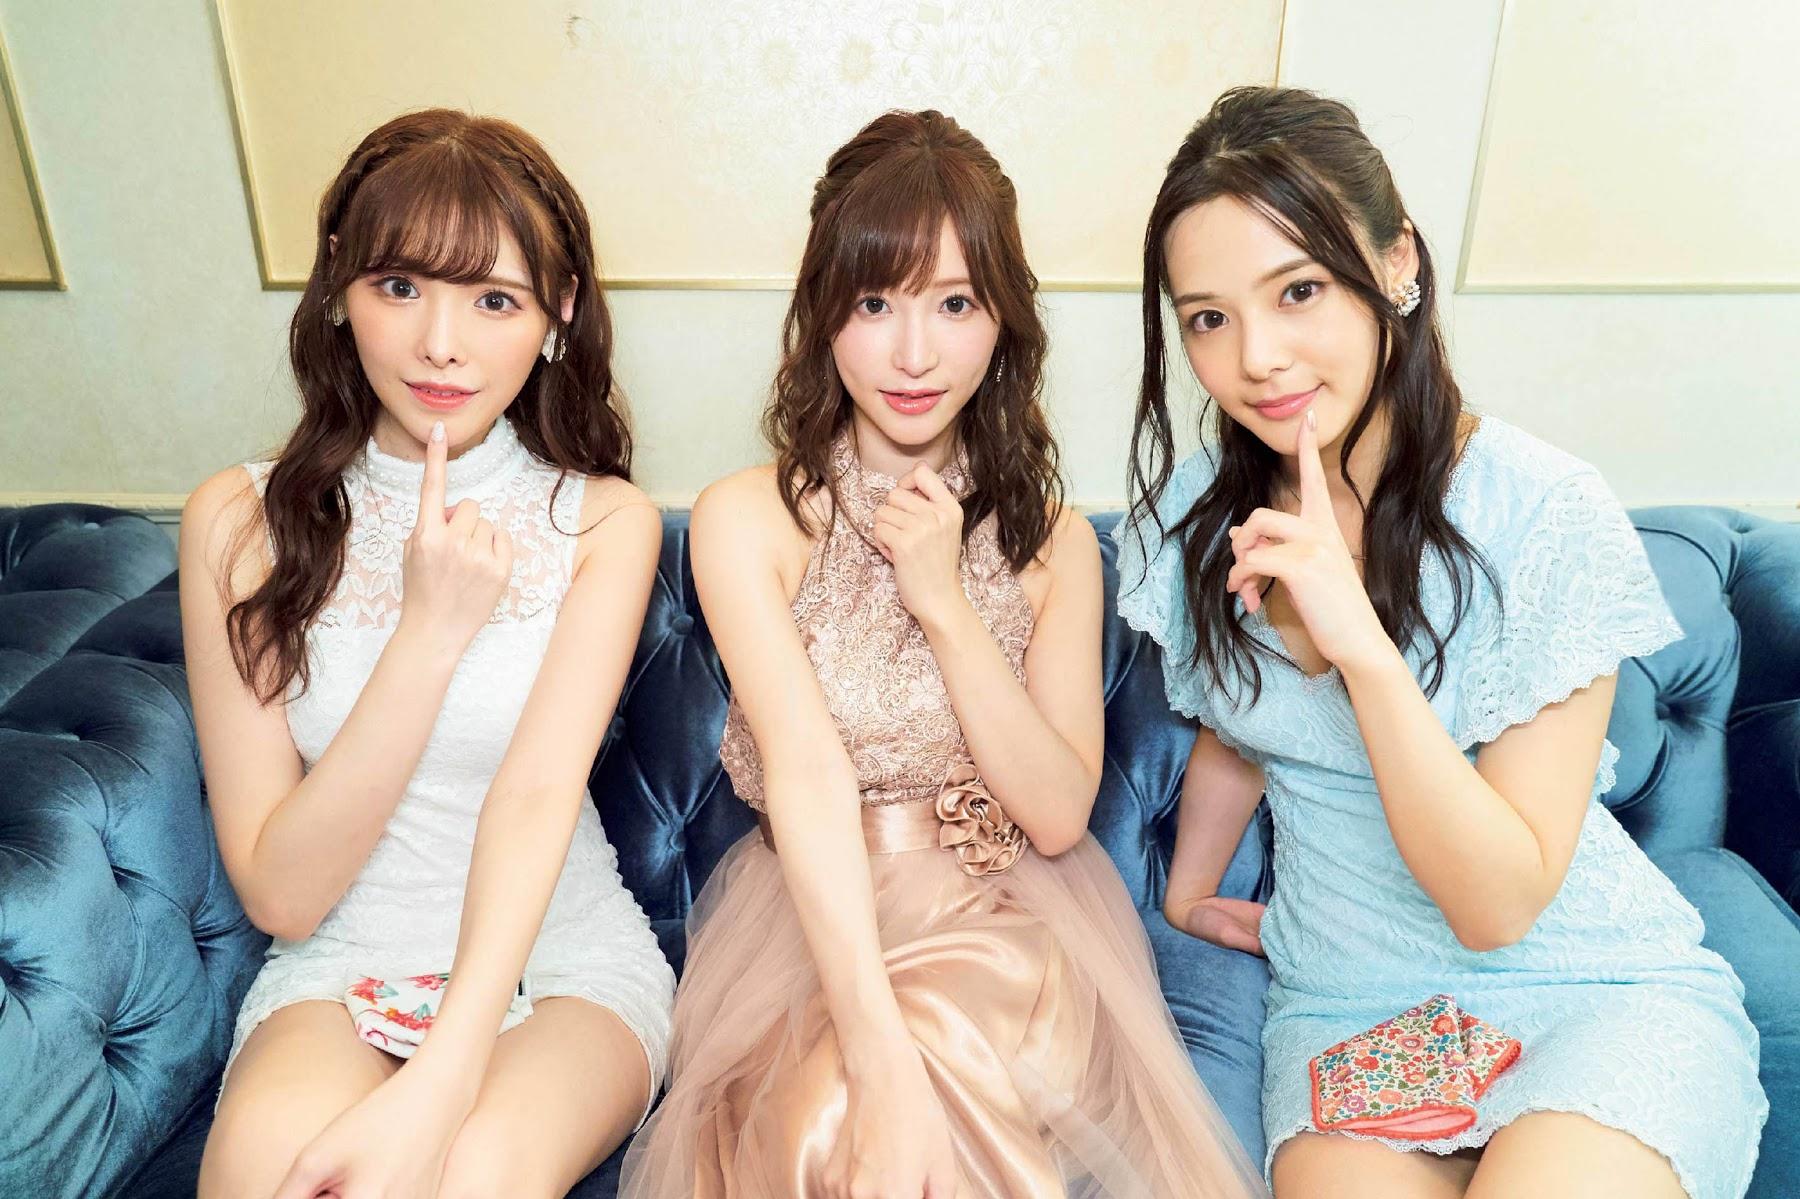 Japans three most beautiful naked women are all lined up Anso Cabaret Hair Nude Arina Hashimoto Arina Tenshi Moe Nene Yoshitaka010